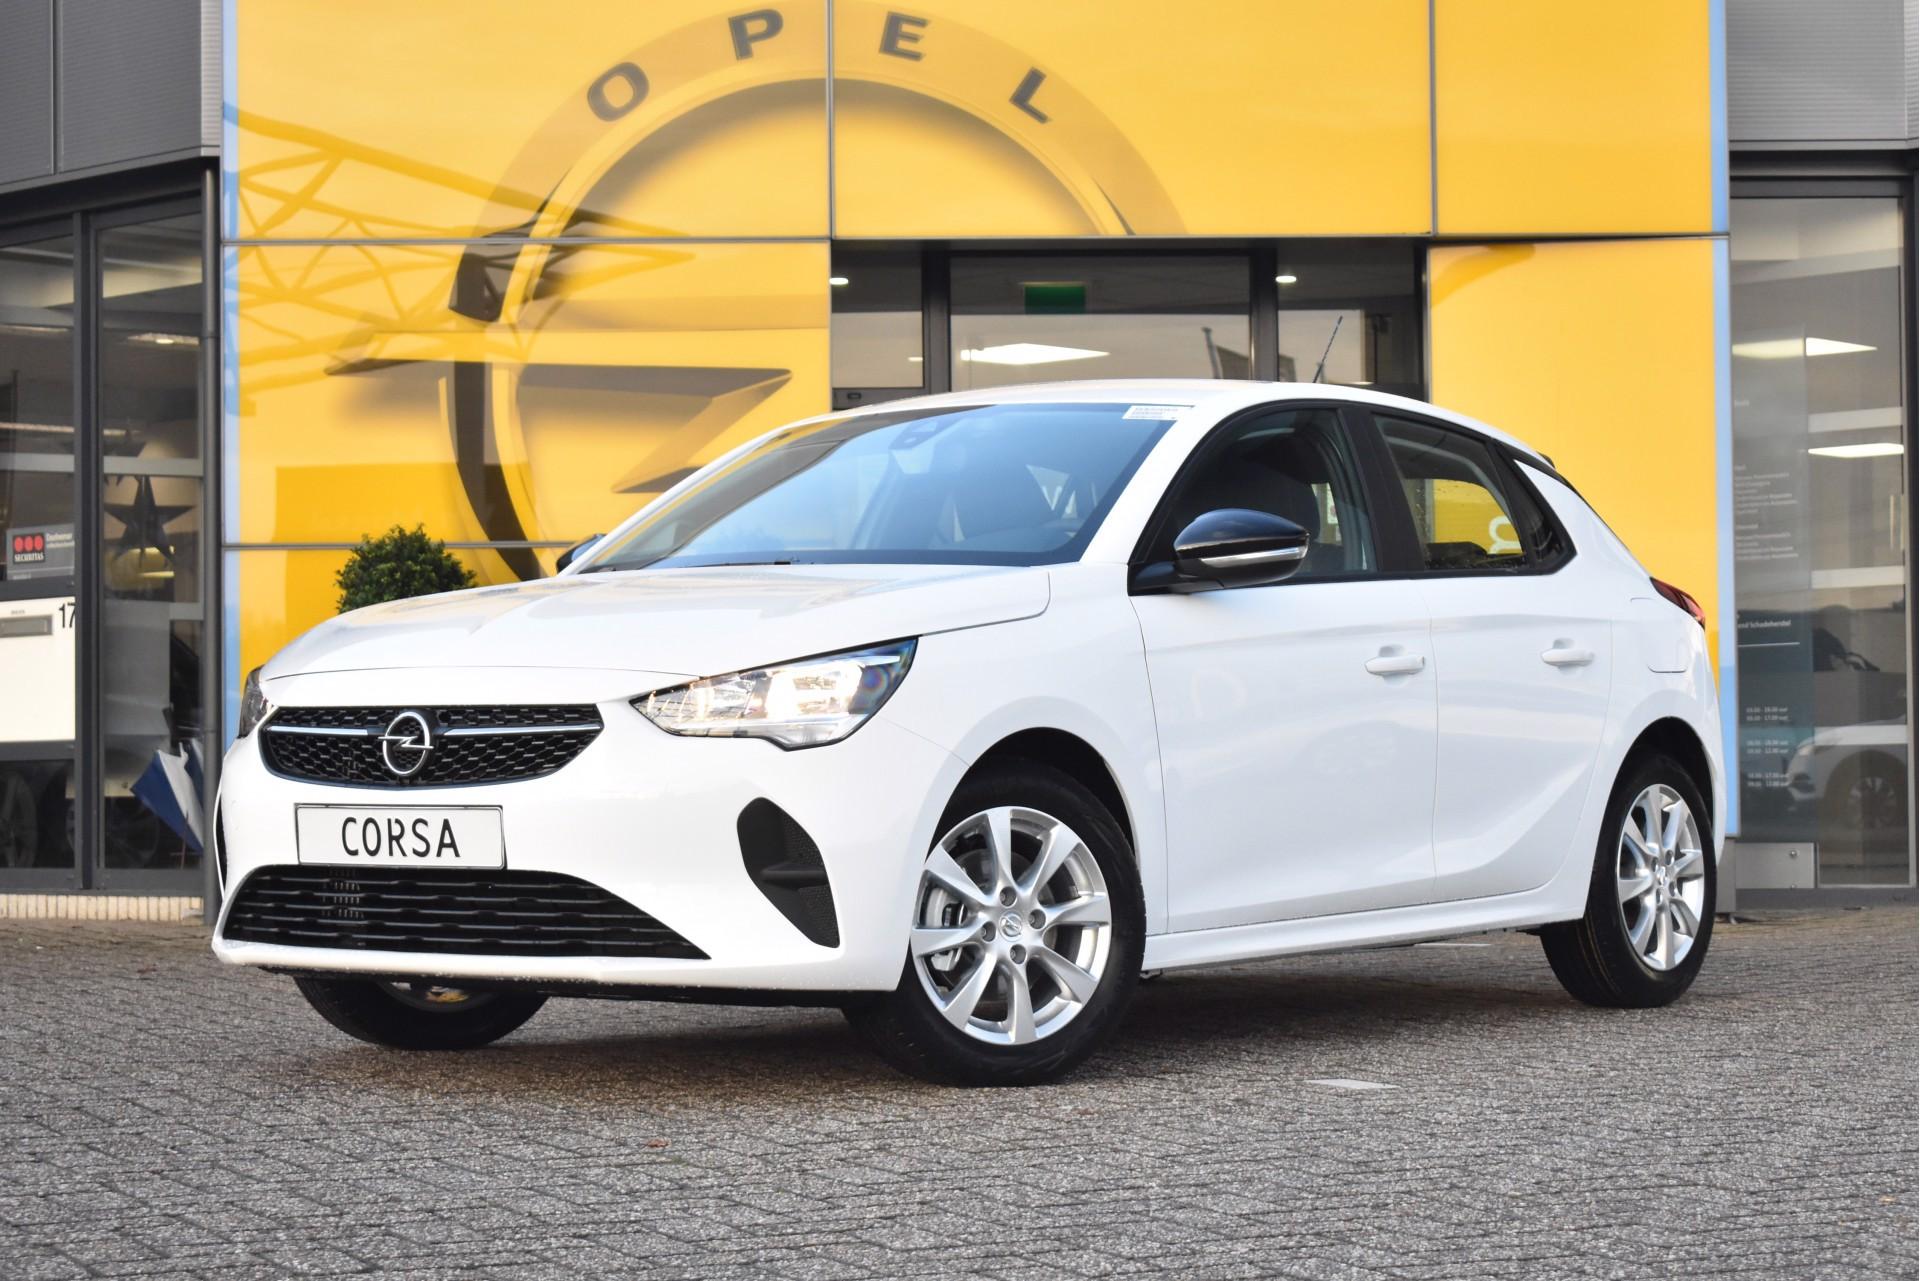 Opel Corsa 1.2 100 Pk Edition 2021 nieuw kopen   Auto.nl